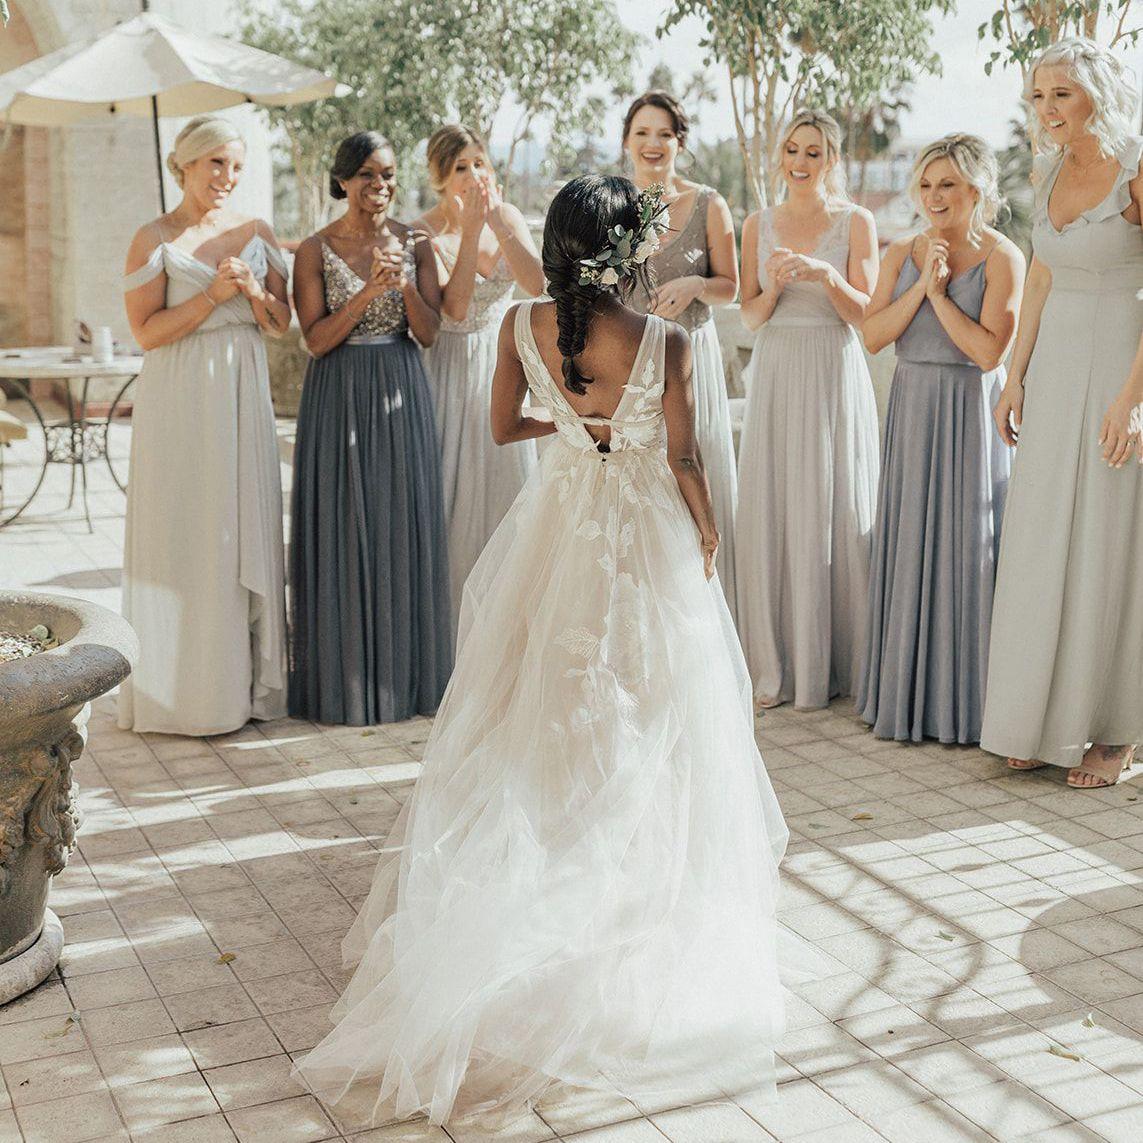 The 5 Best Bridesmaid Dress Rental Websites Of 2021